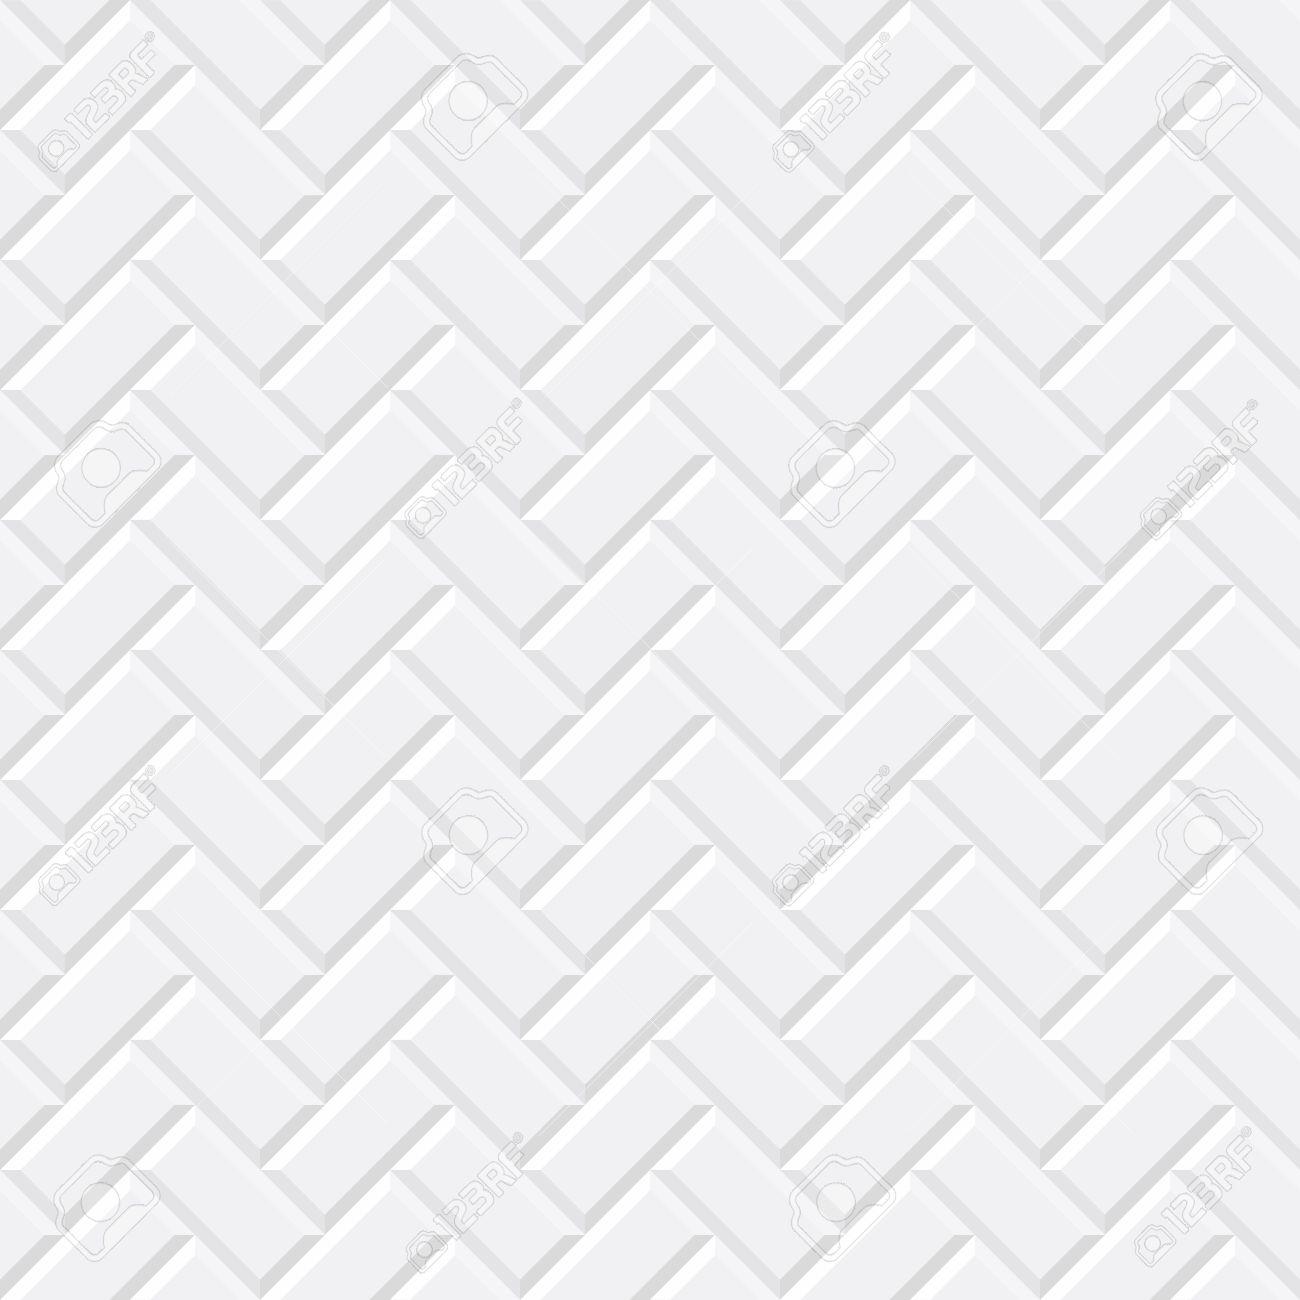 White tiles, ceramic brick. Diagonal seamless pattern. Vector illustration EPS 10 - 66438434